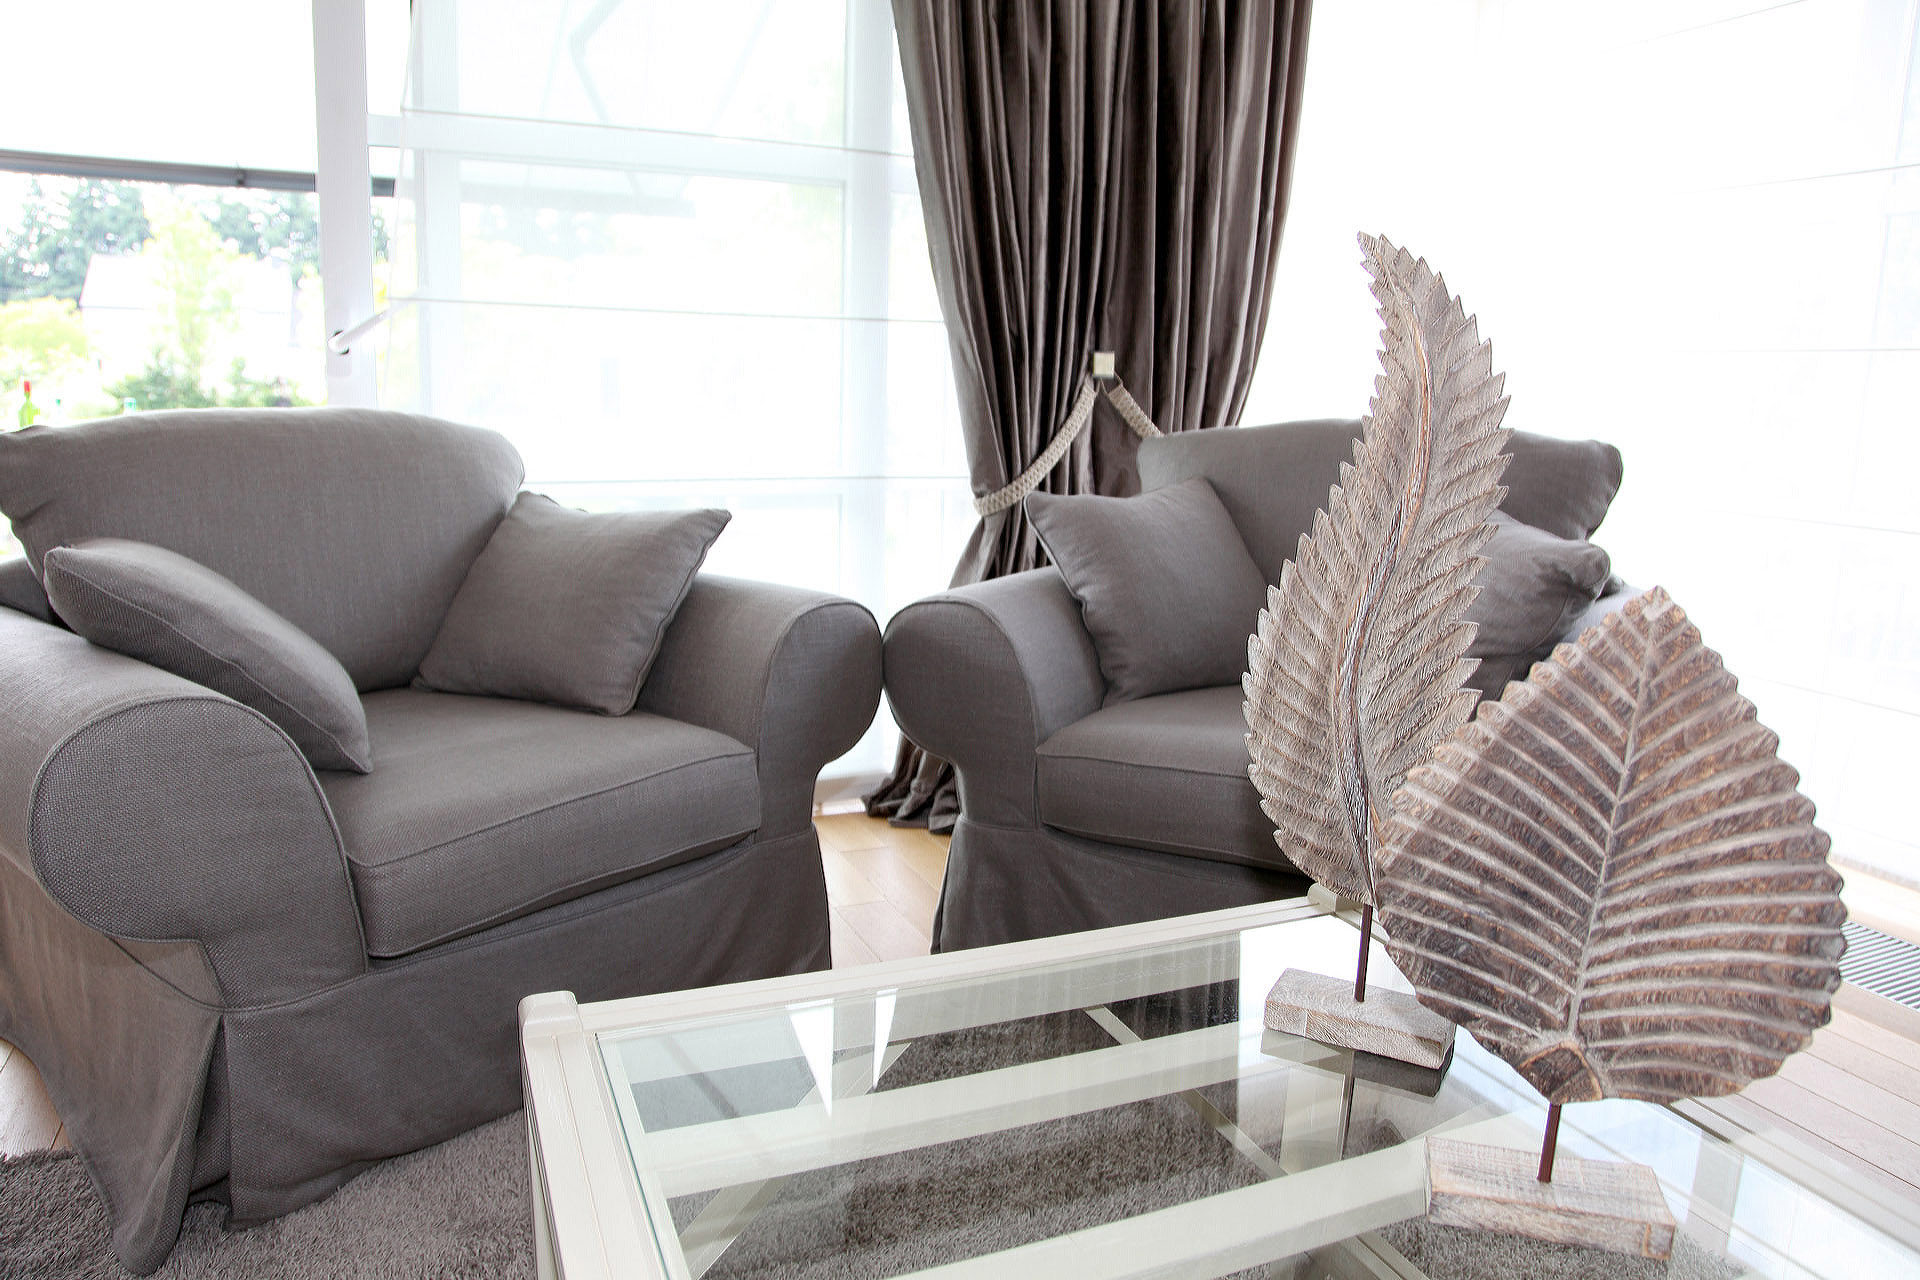 Cottage interieur marcotte style